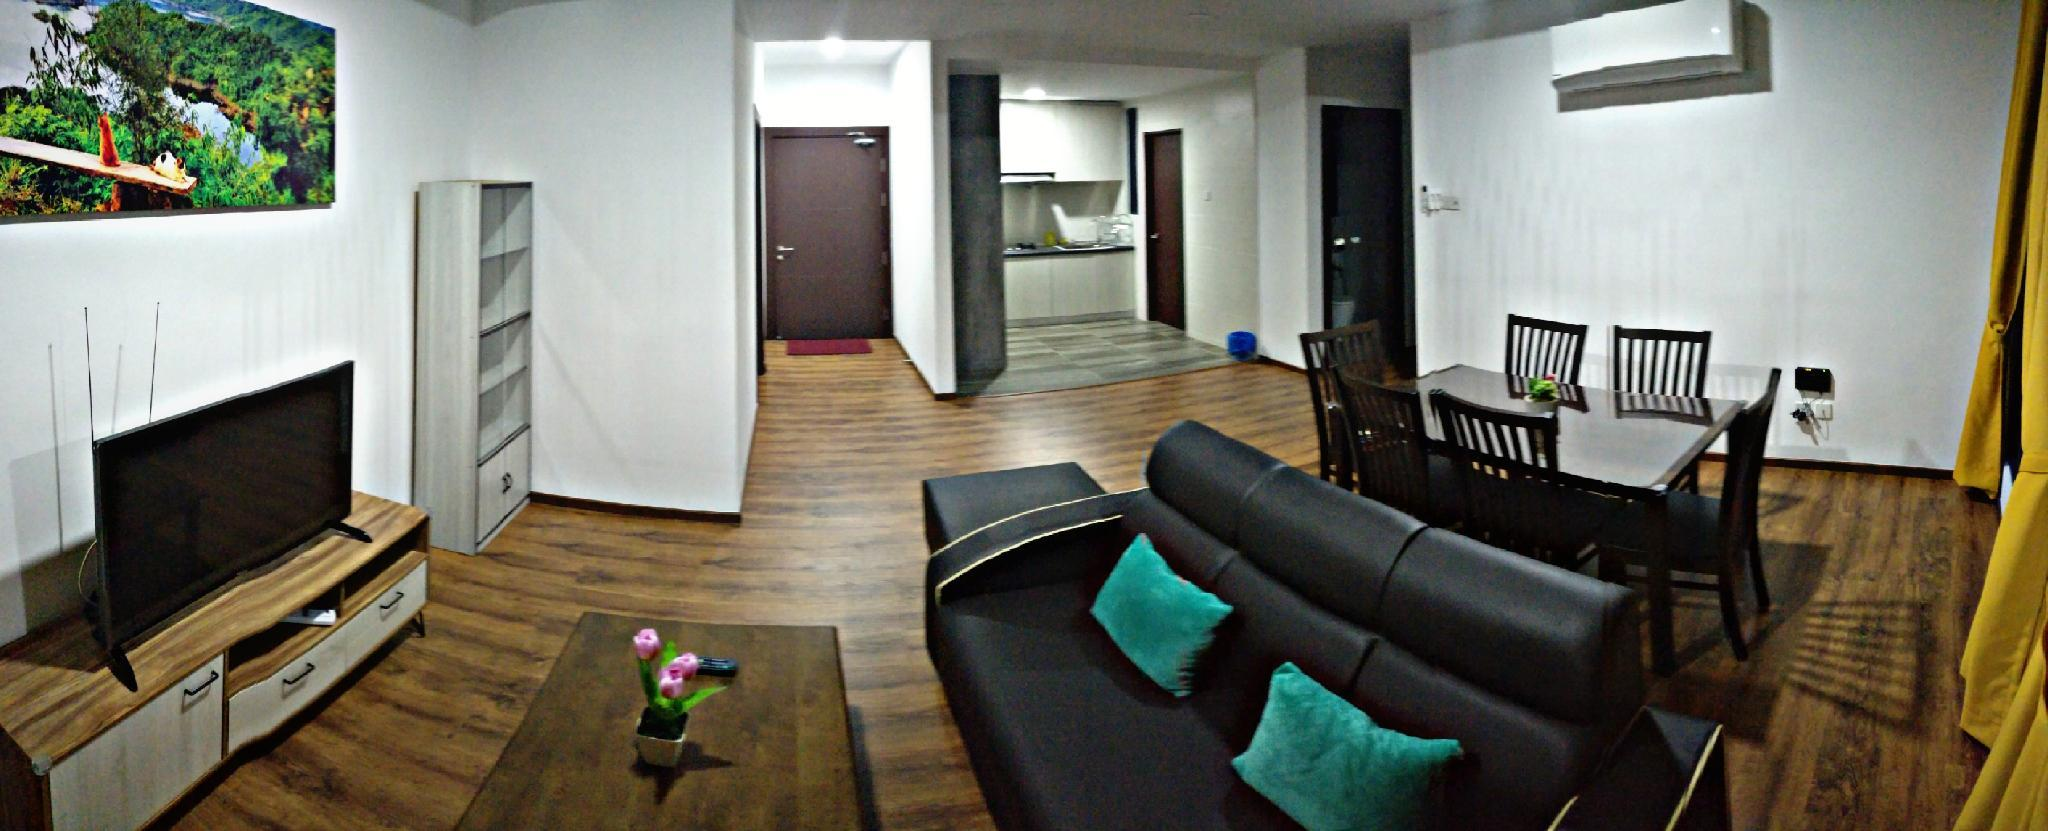 VivaCity 1204 Residence